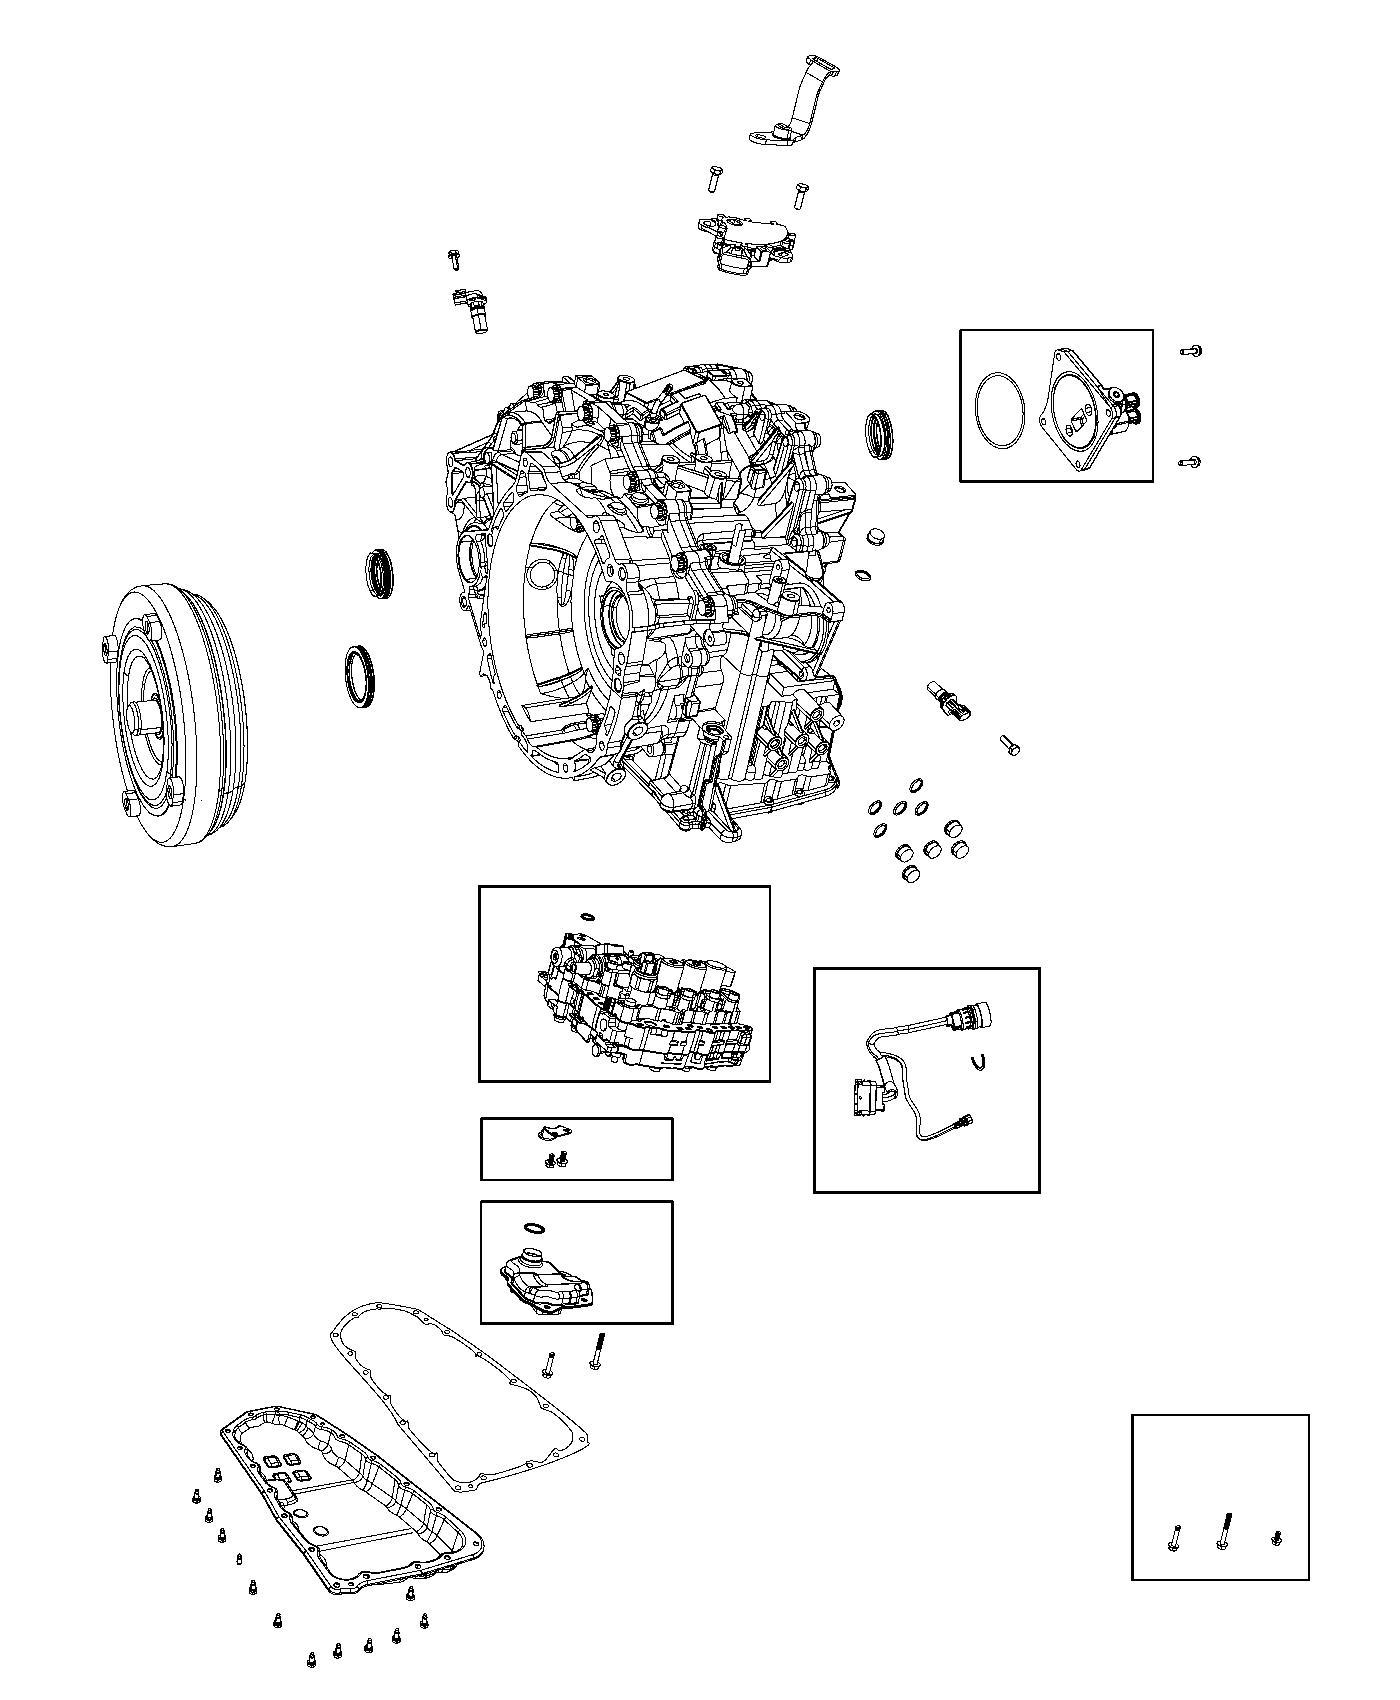 2011 Dodge Caliber Valve Body Kit  Transmission  Service